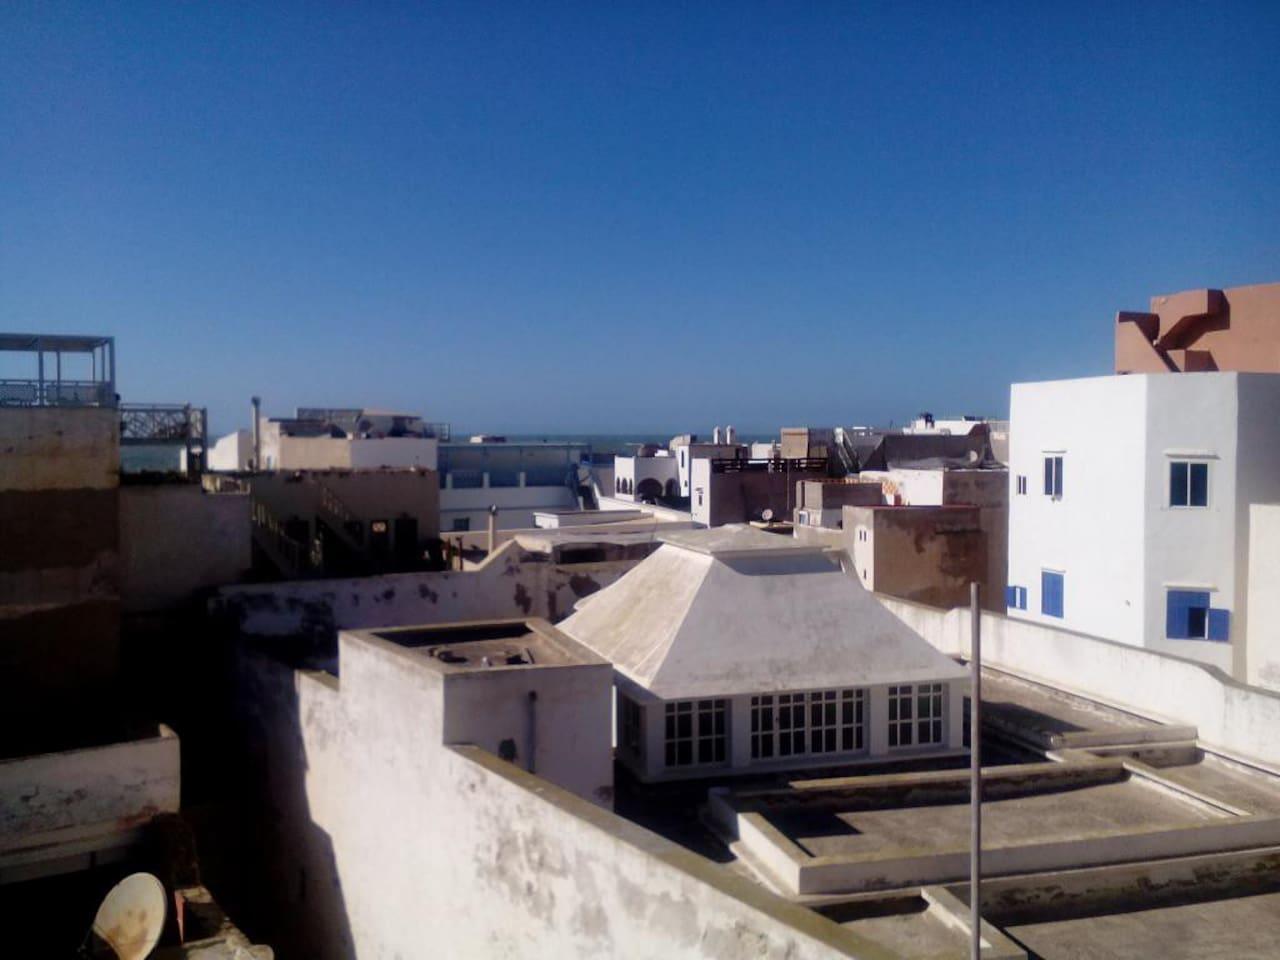 Vue depuis la terrasse, on aperçoit la mer